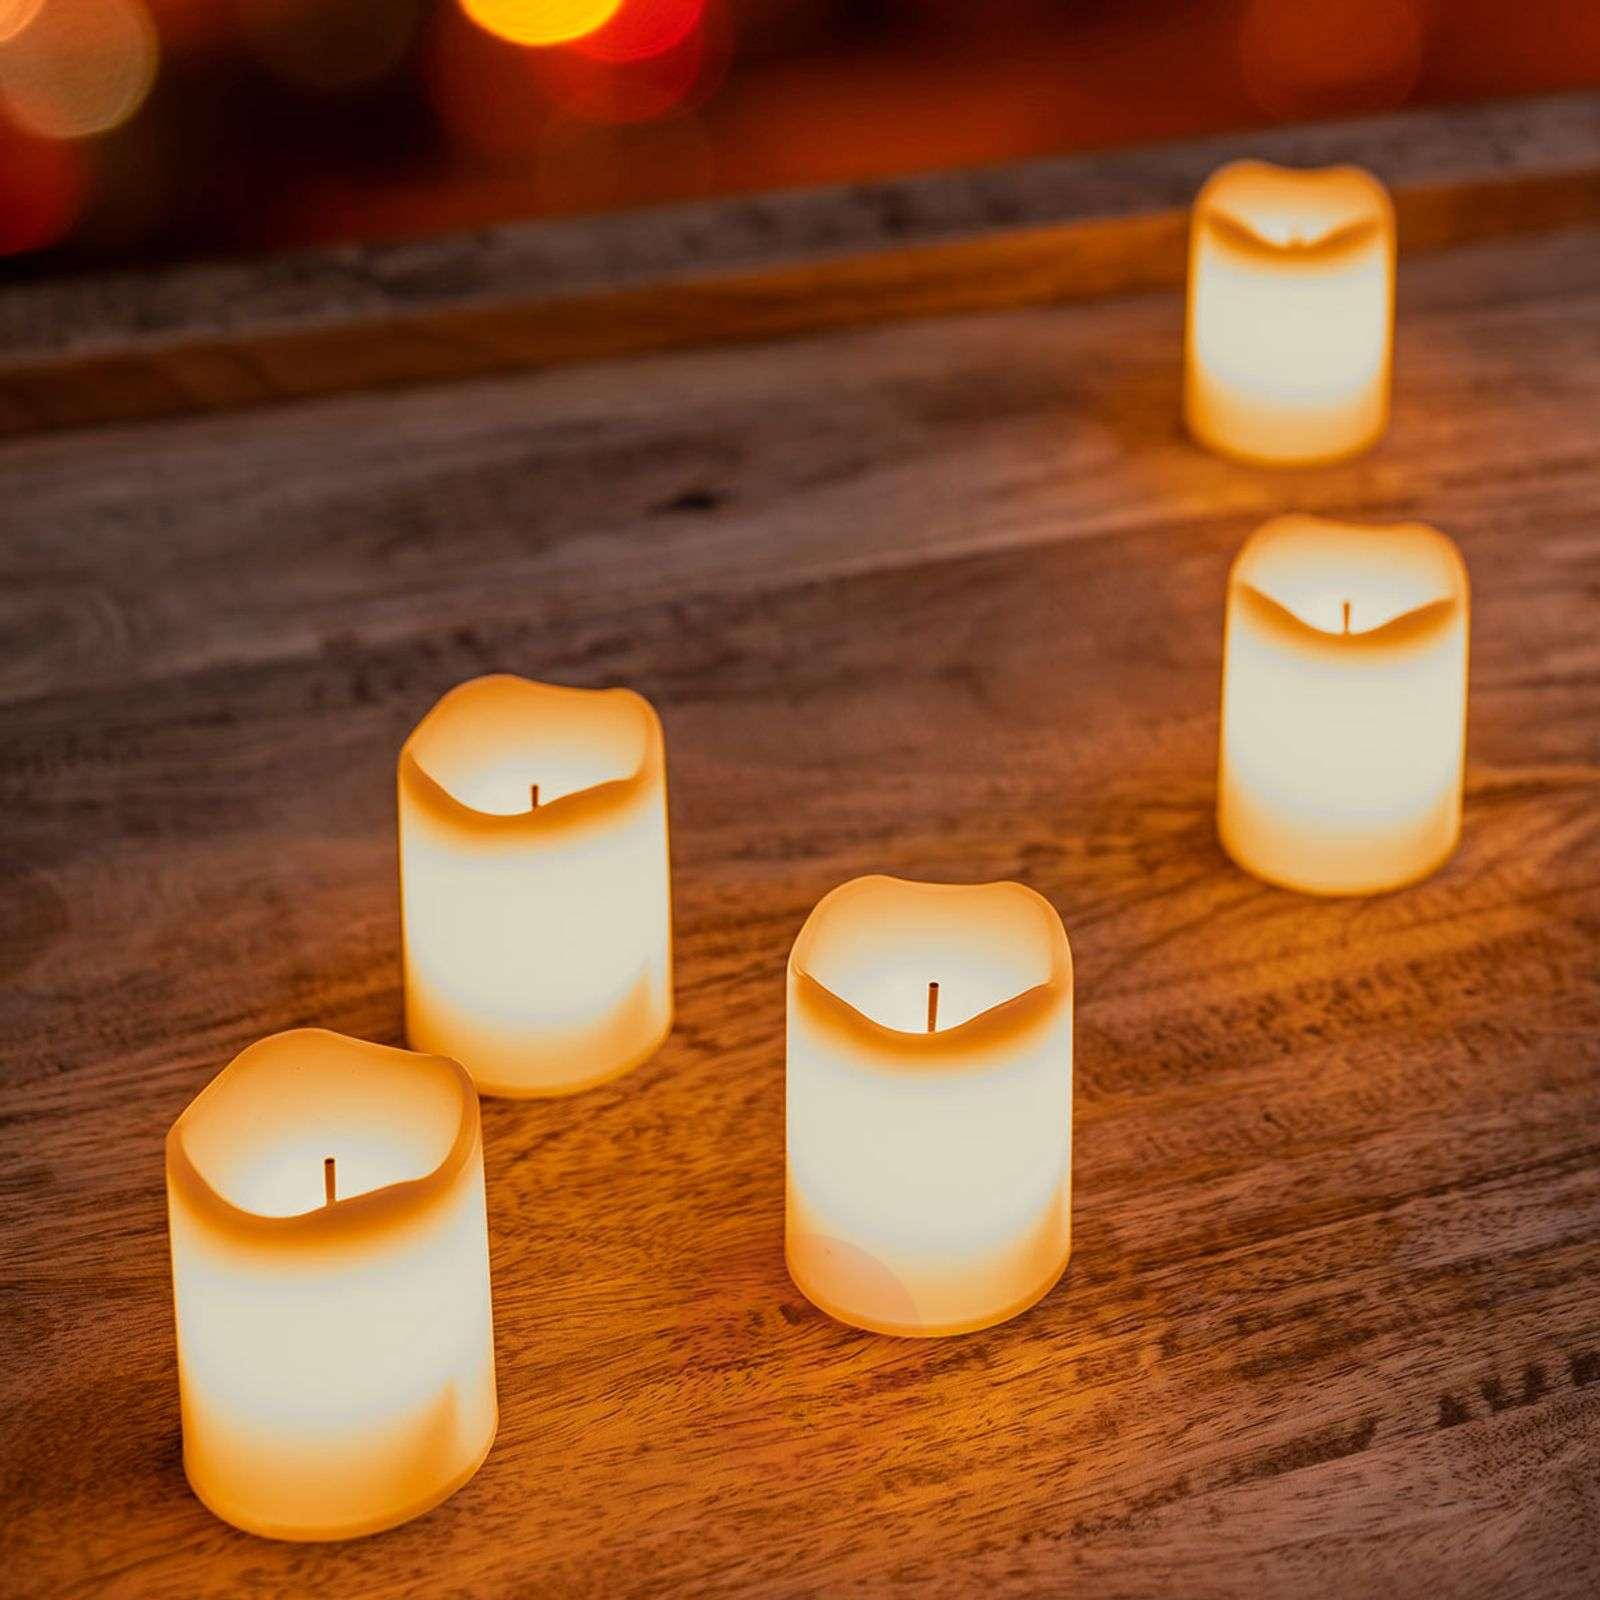 Rechargeable LED tea light Chargeme, set of 6-1523172-01